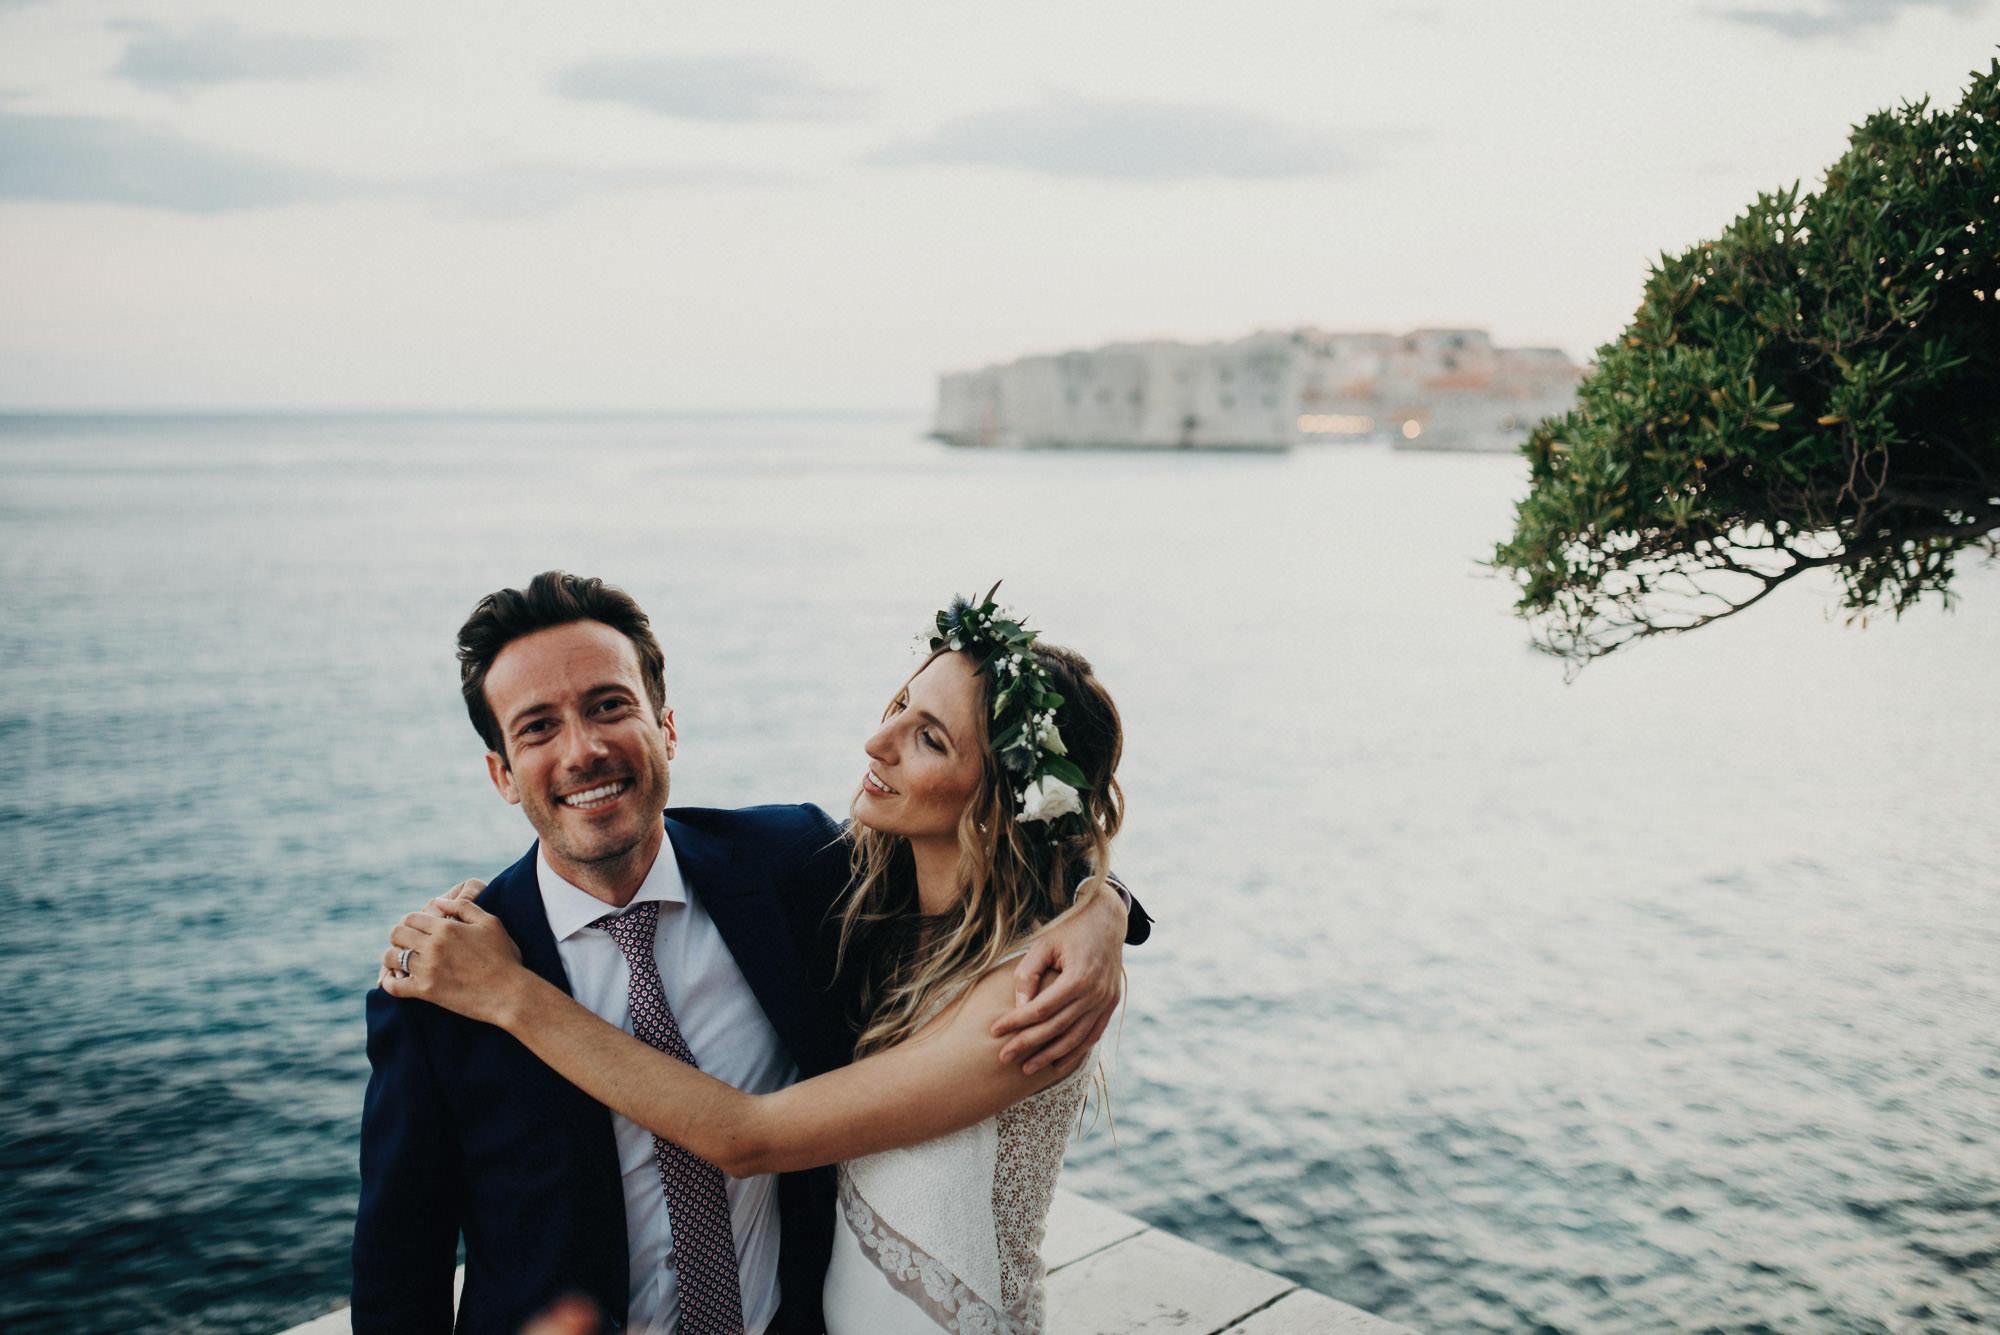 dubrovnik_croatia_wedding_photographer-jere_satamo-destination_weddings-075-web.jpg